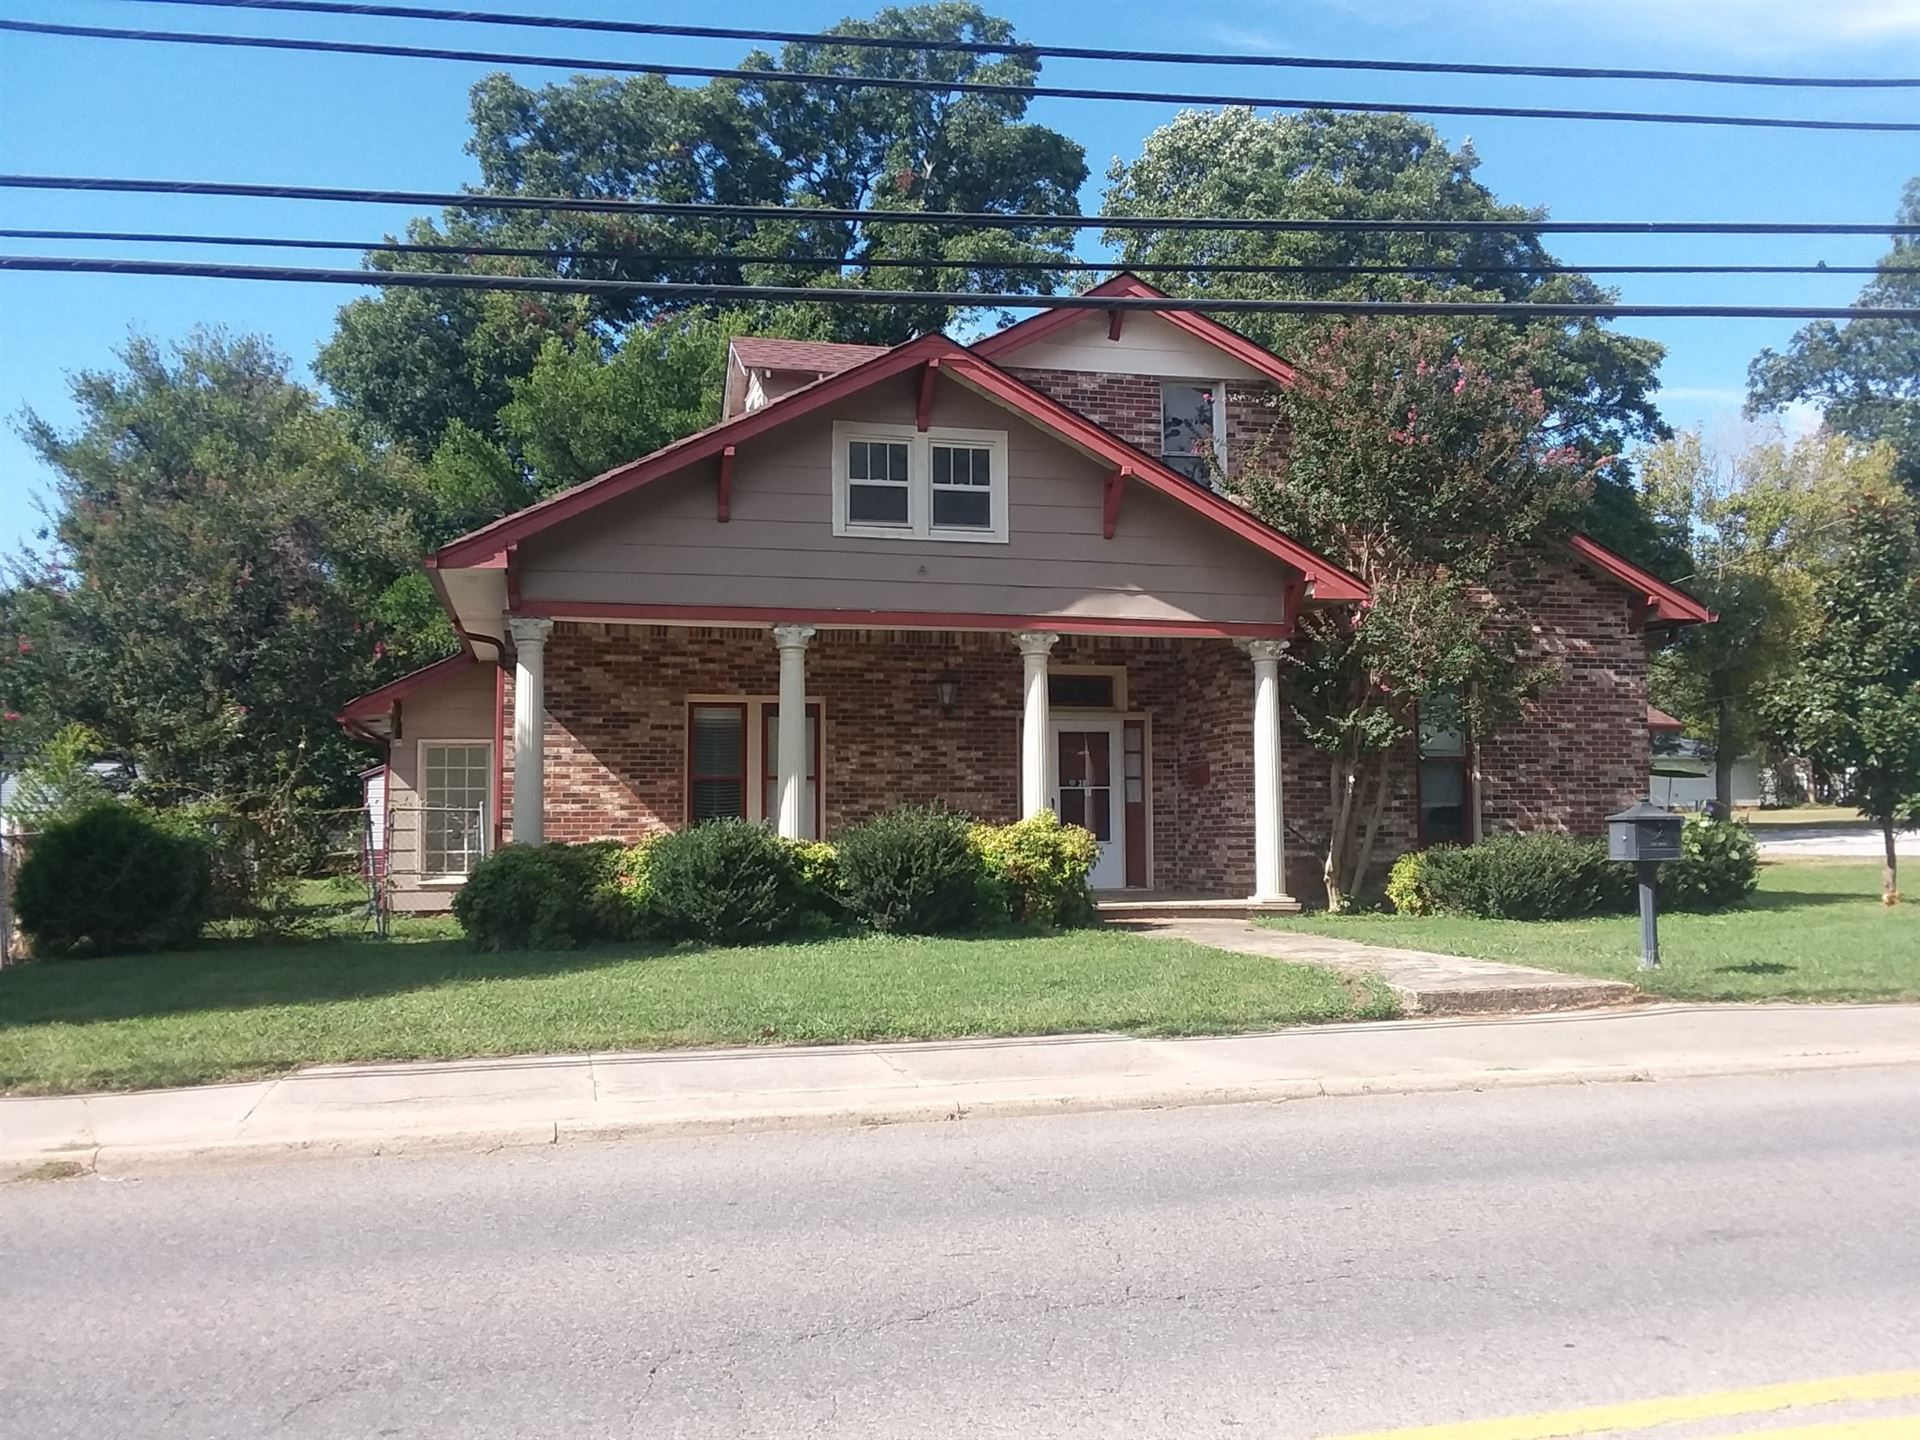 309 N High St, Winchester, TN 37398 - MLS#: 2191907